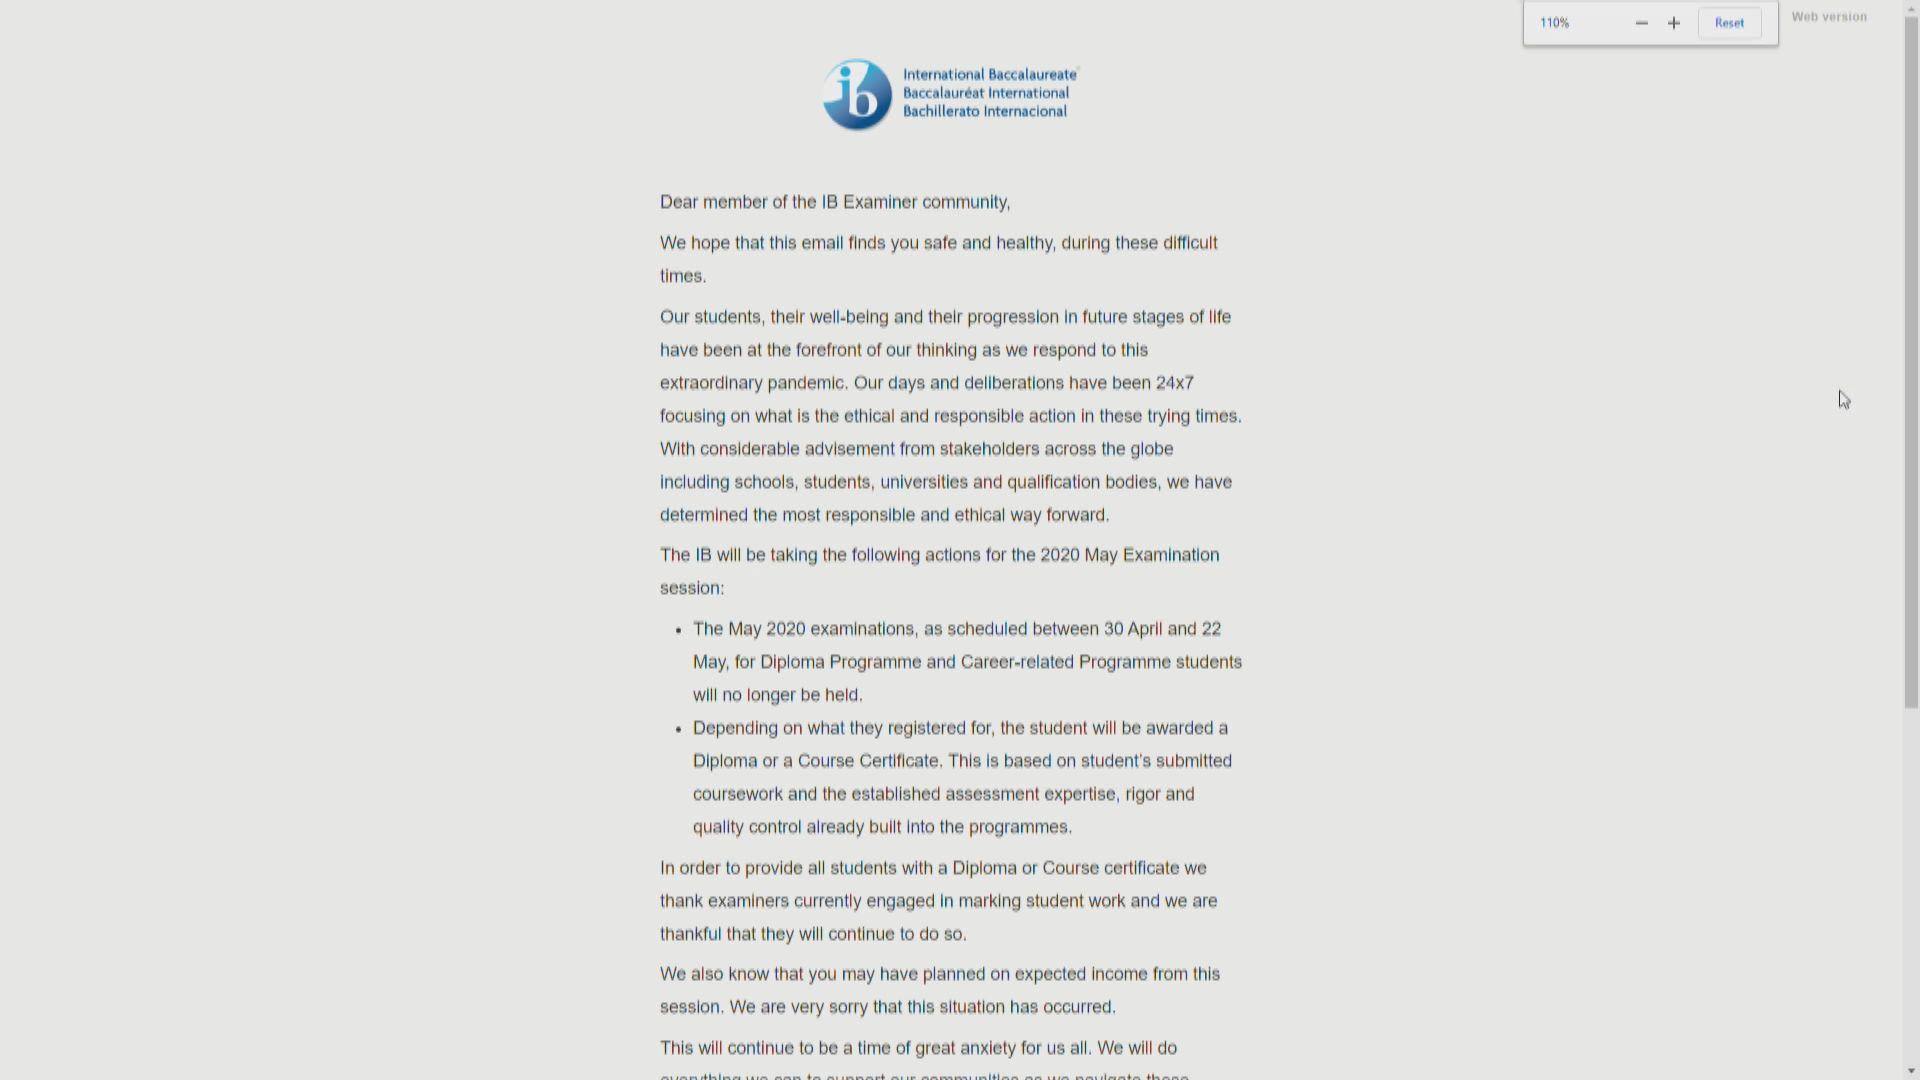 IB向考試委員發通告指取消5月考試 官網未正式宣布